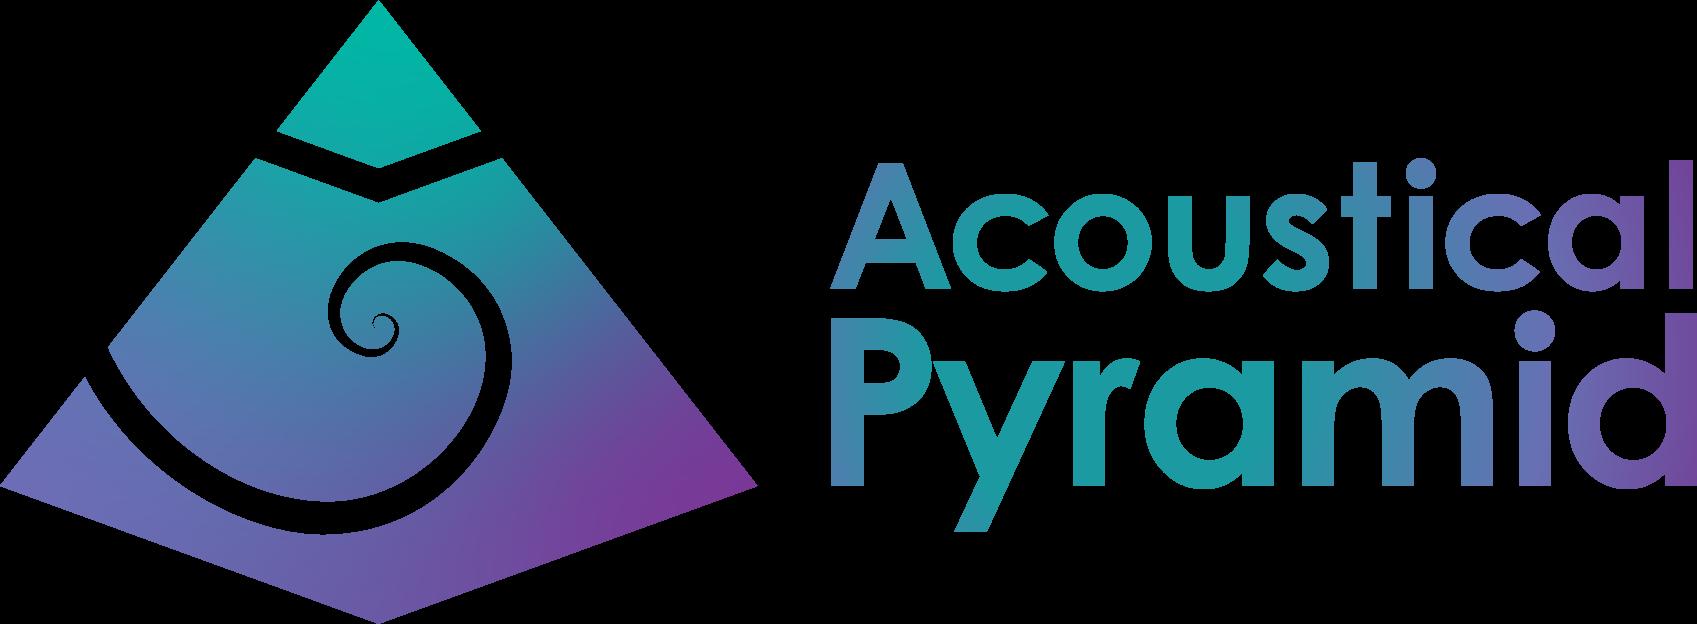 Acoustical Pyramid Inc.